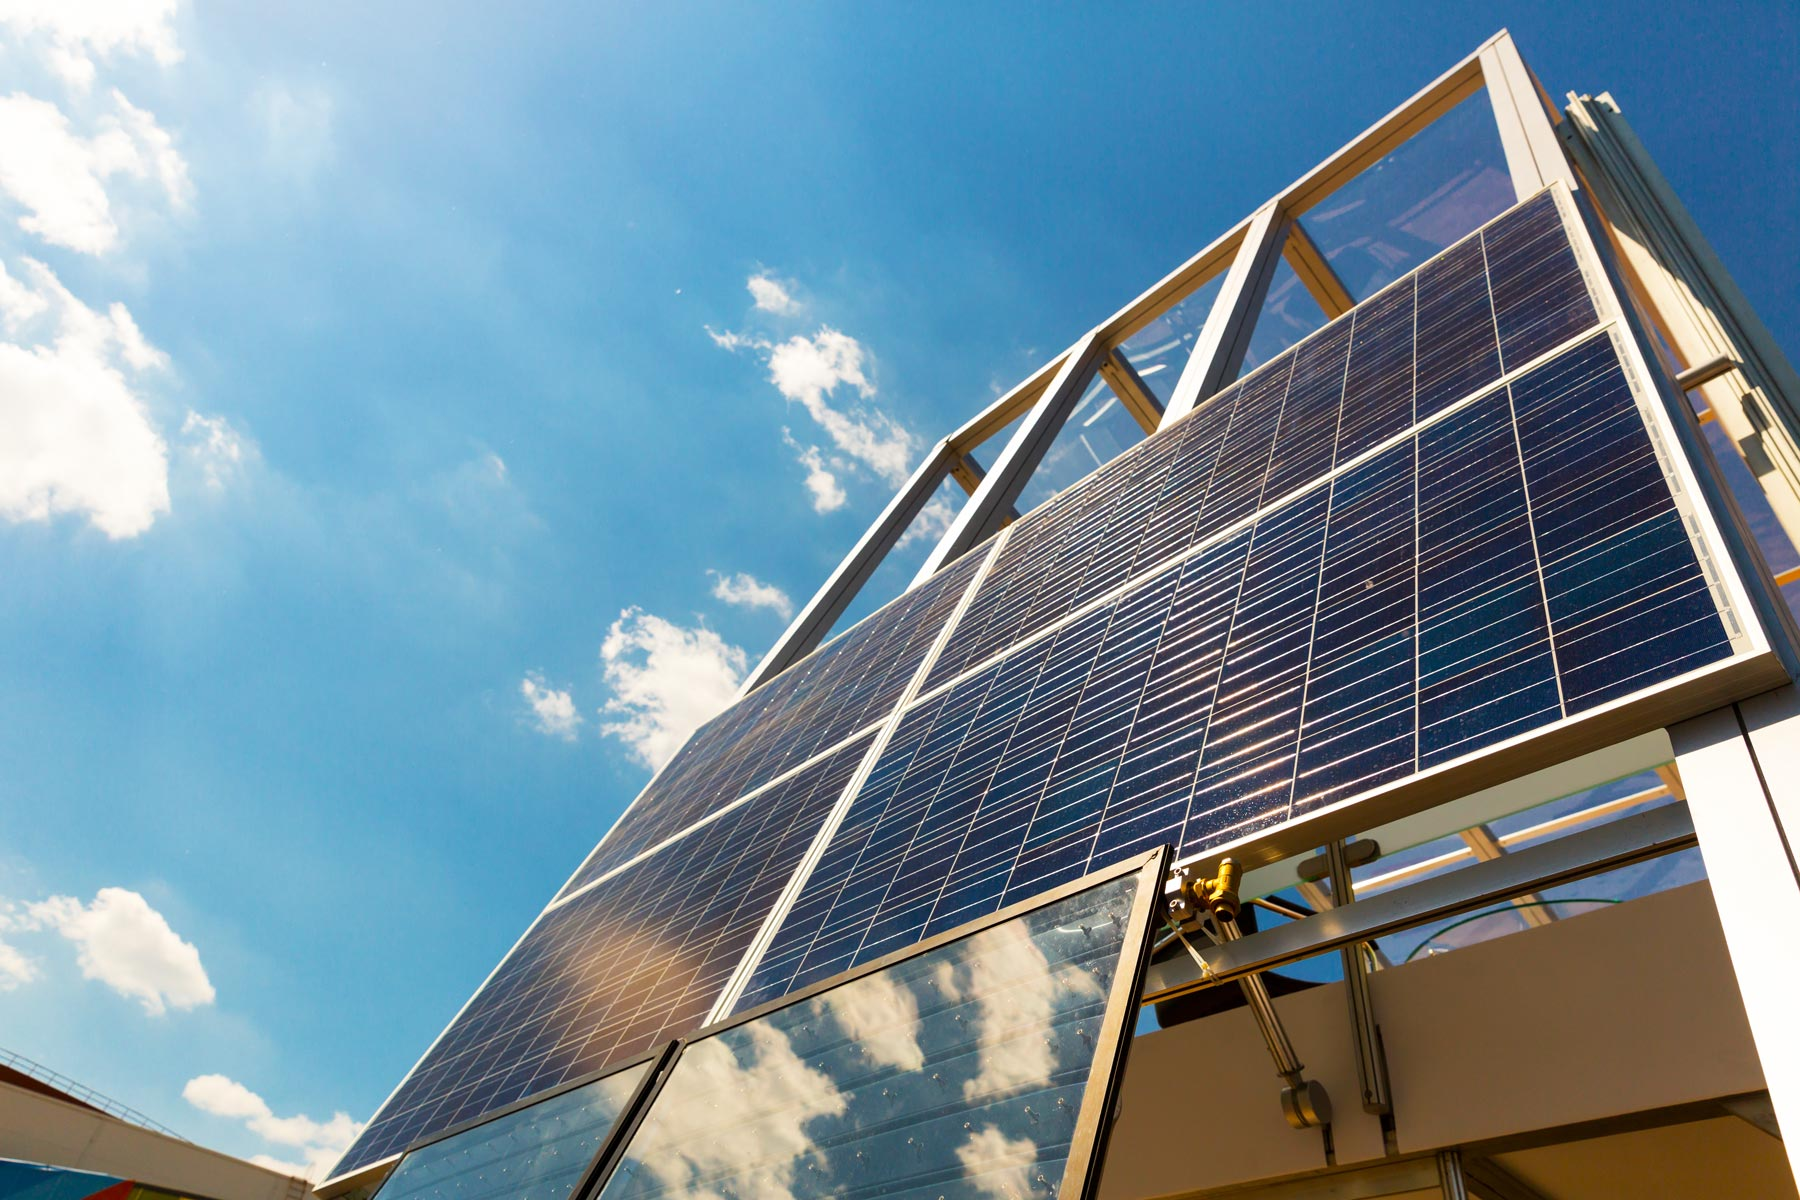 eless-efficientamento-energetico-sanificazione-aria-1